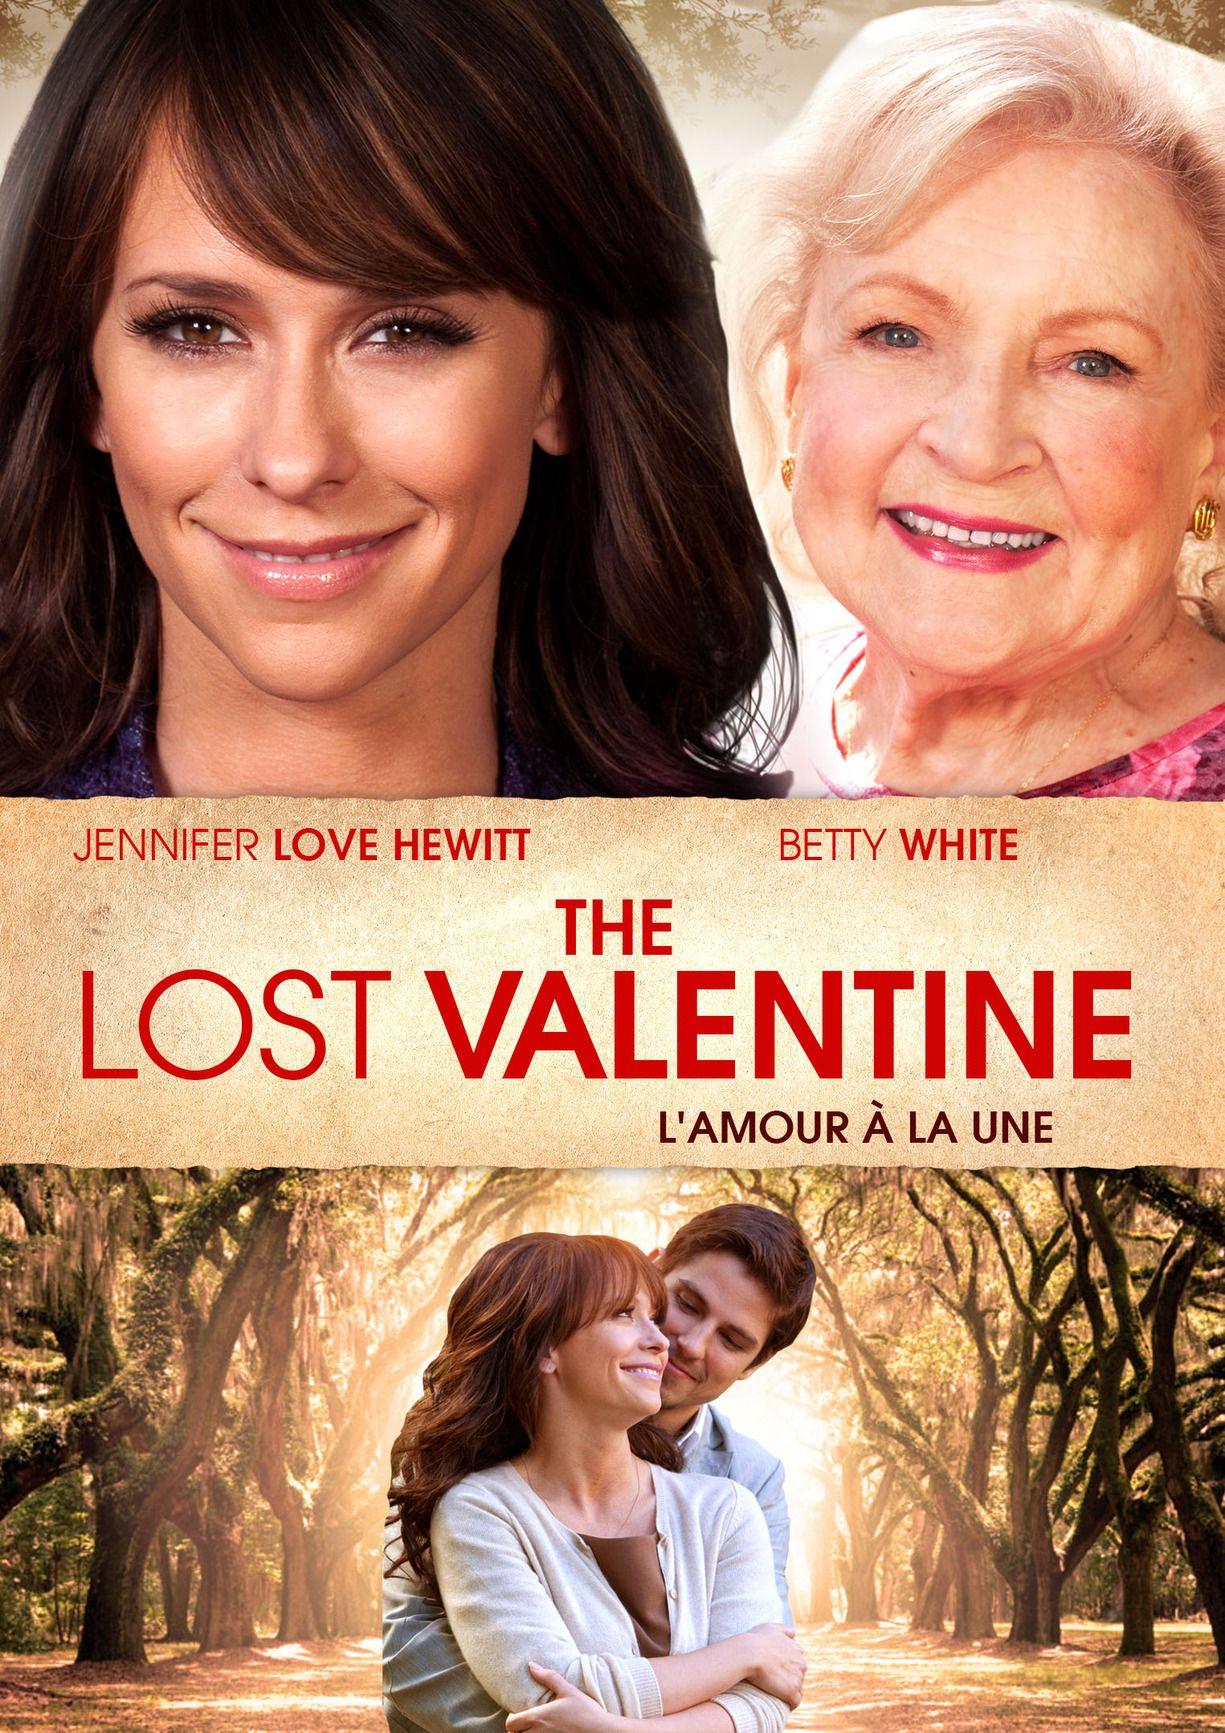 The Lost Valentine Amor Desaparecido 2011 Sean Faris Betty White Meghann Fahy Jennifer Love He Romance Movie Poster Jennifer Love Hewitt Romance Movies